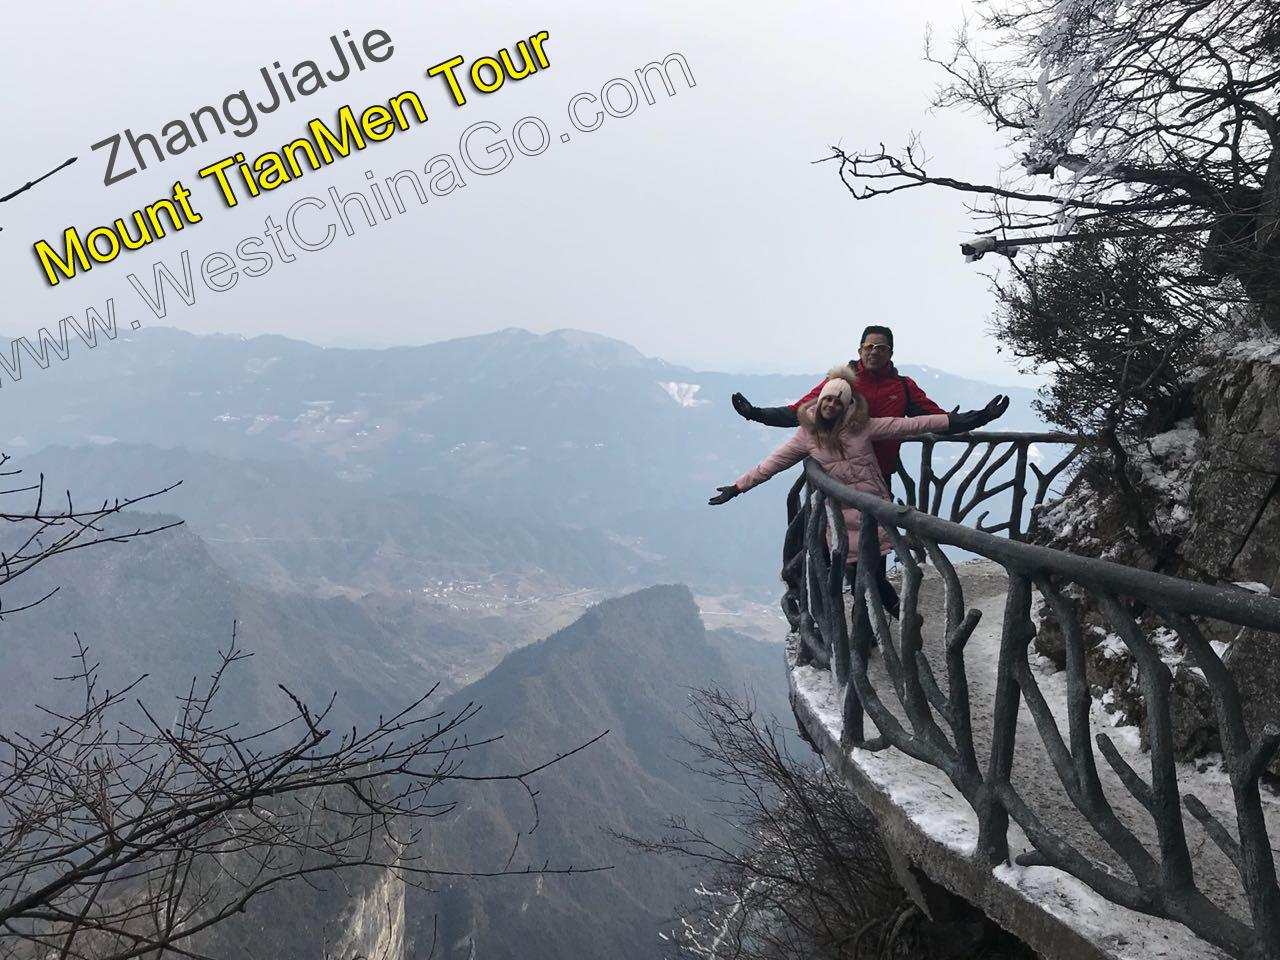 Mount TianMenshan Tourist Map